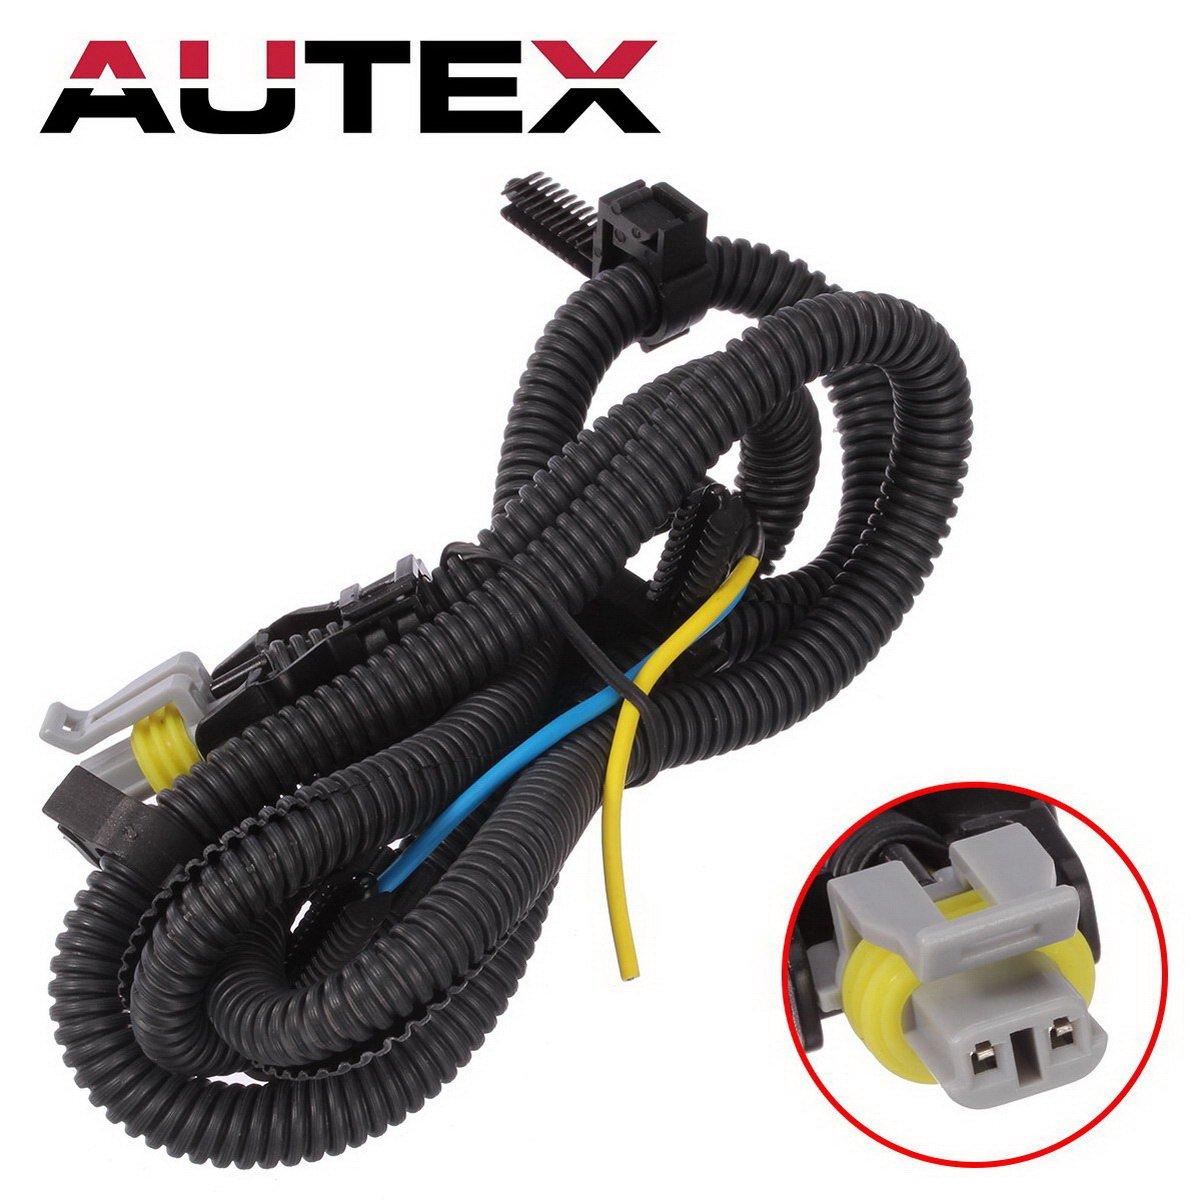 autex 1pcs n15002 abs wheel speed sensor wire compatible with buick century  & lacrosse & rendezvous/cadillac cts & deville & srx & xlr/chevrolet impala